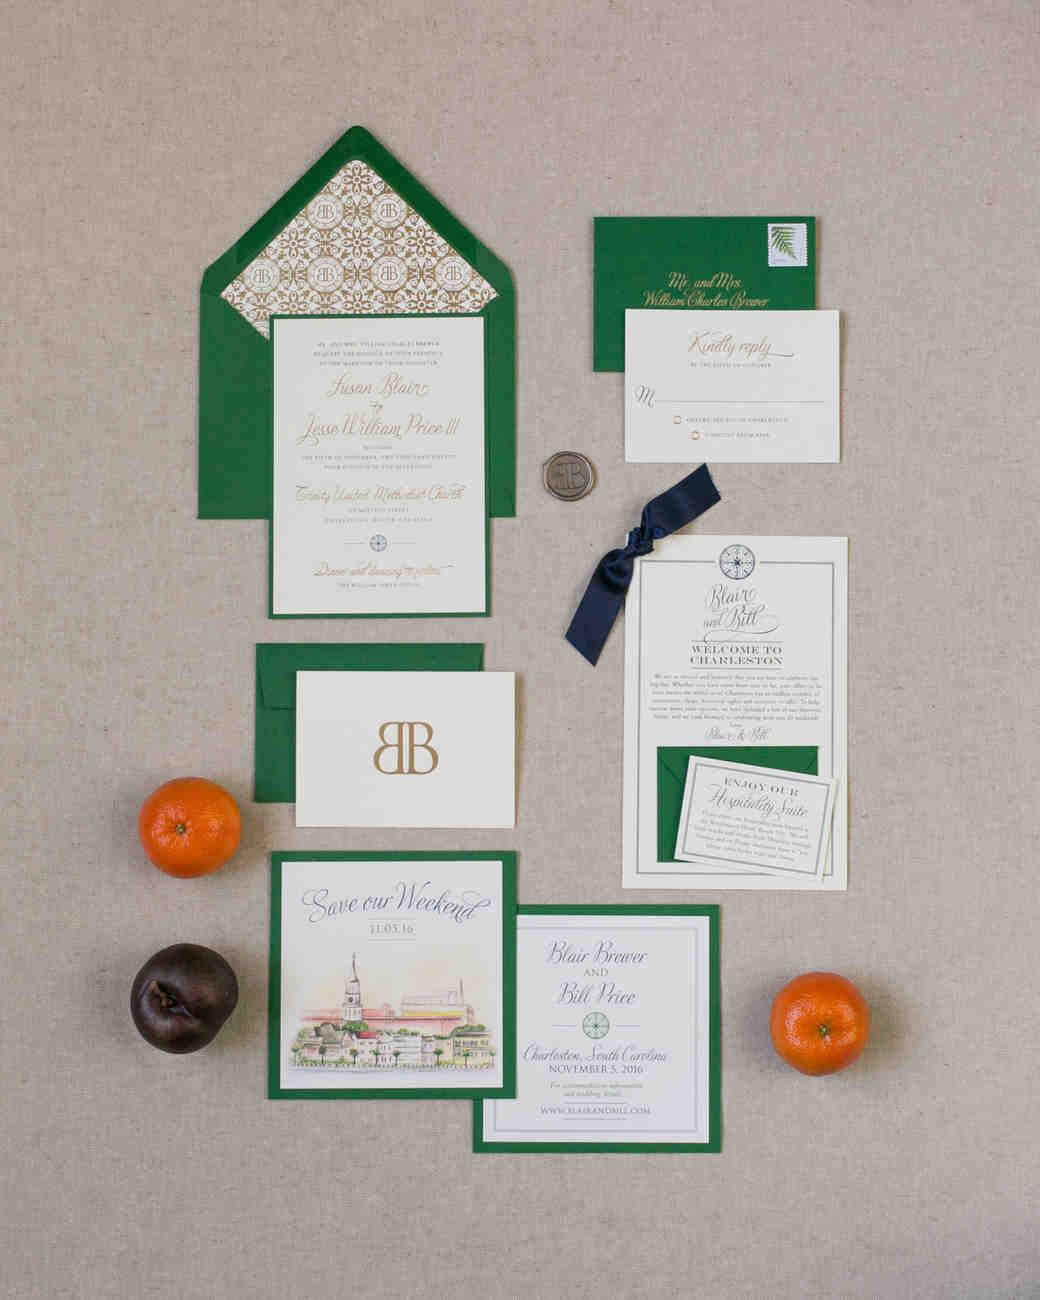 envelope invites ashley seawell